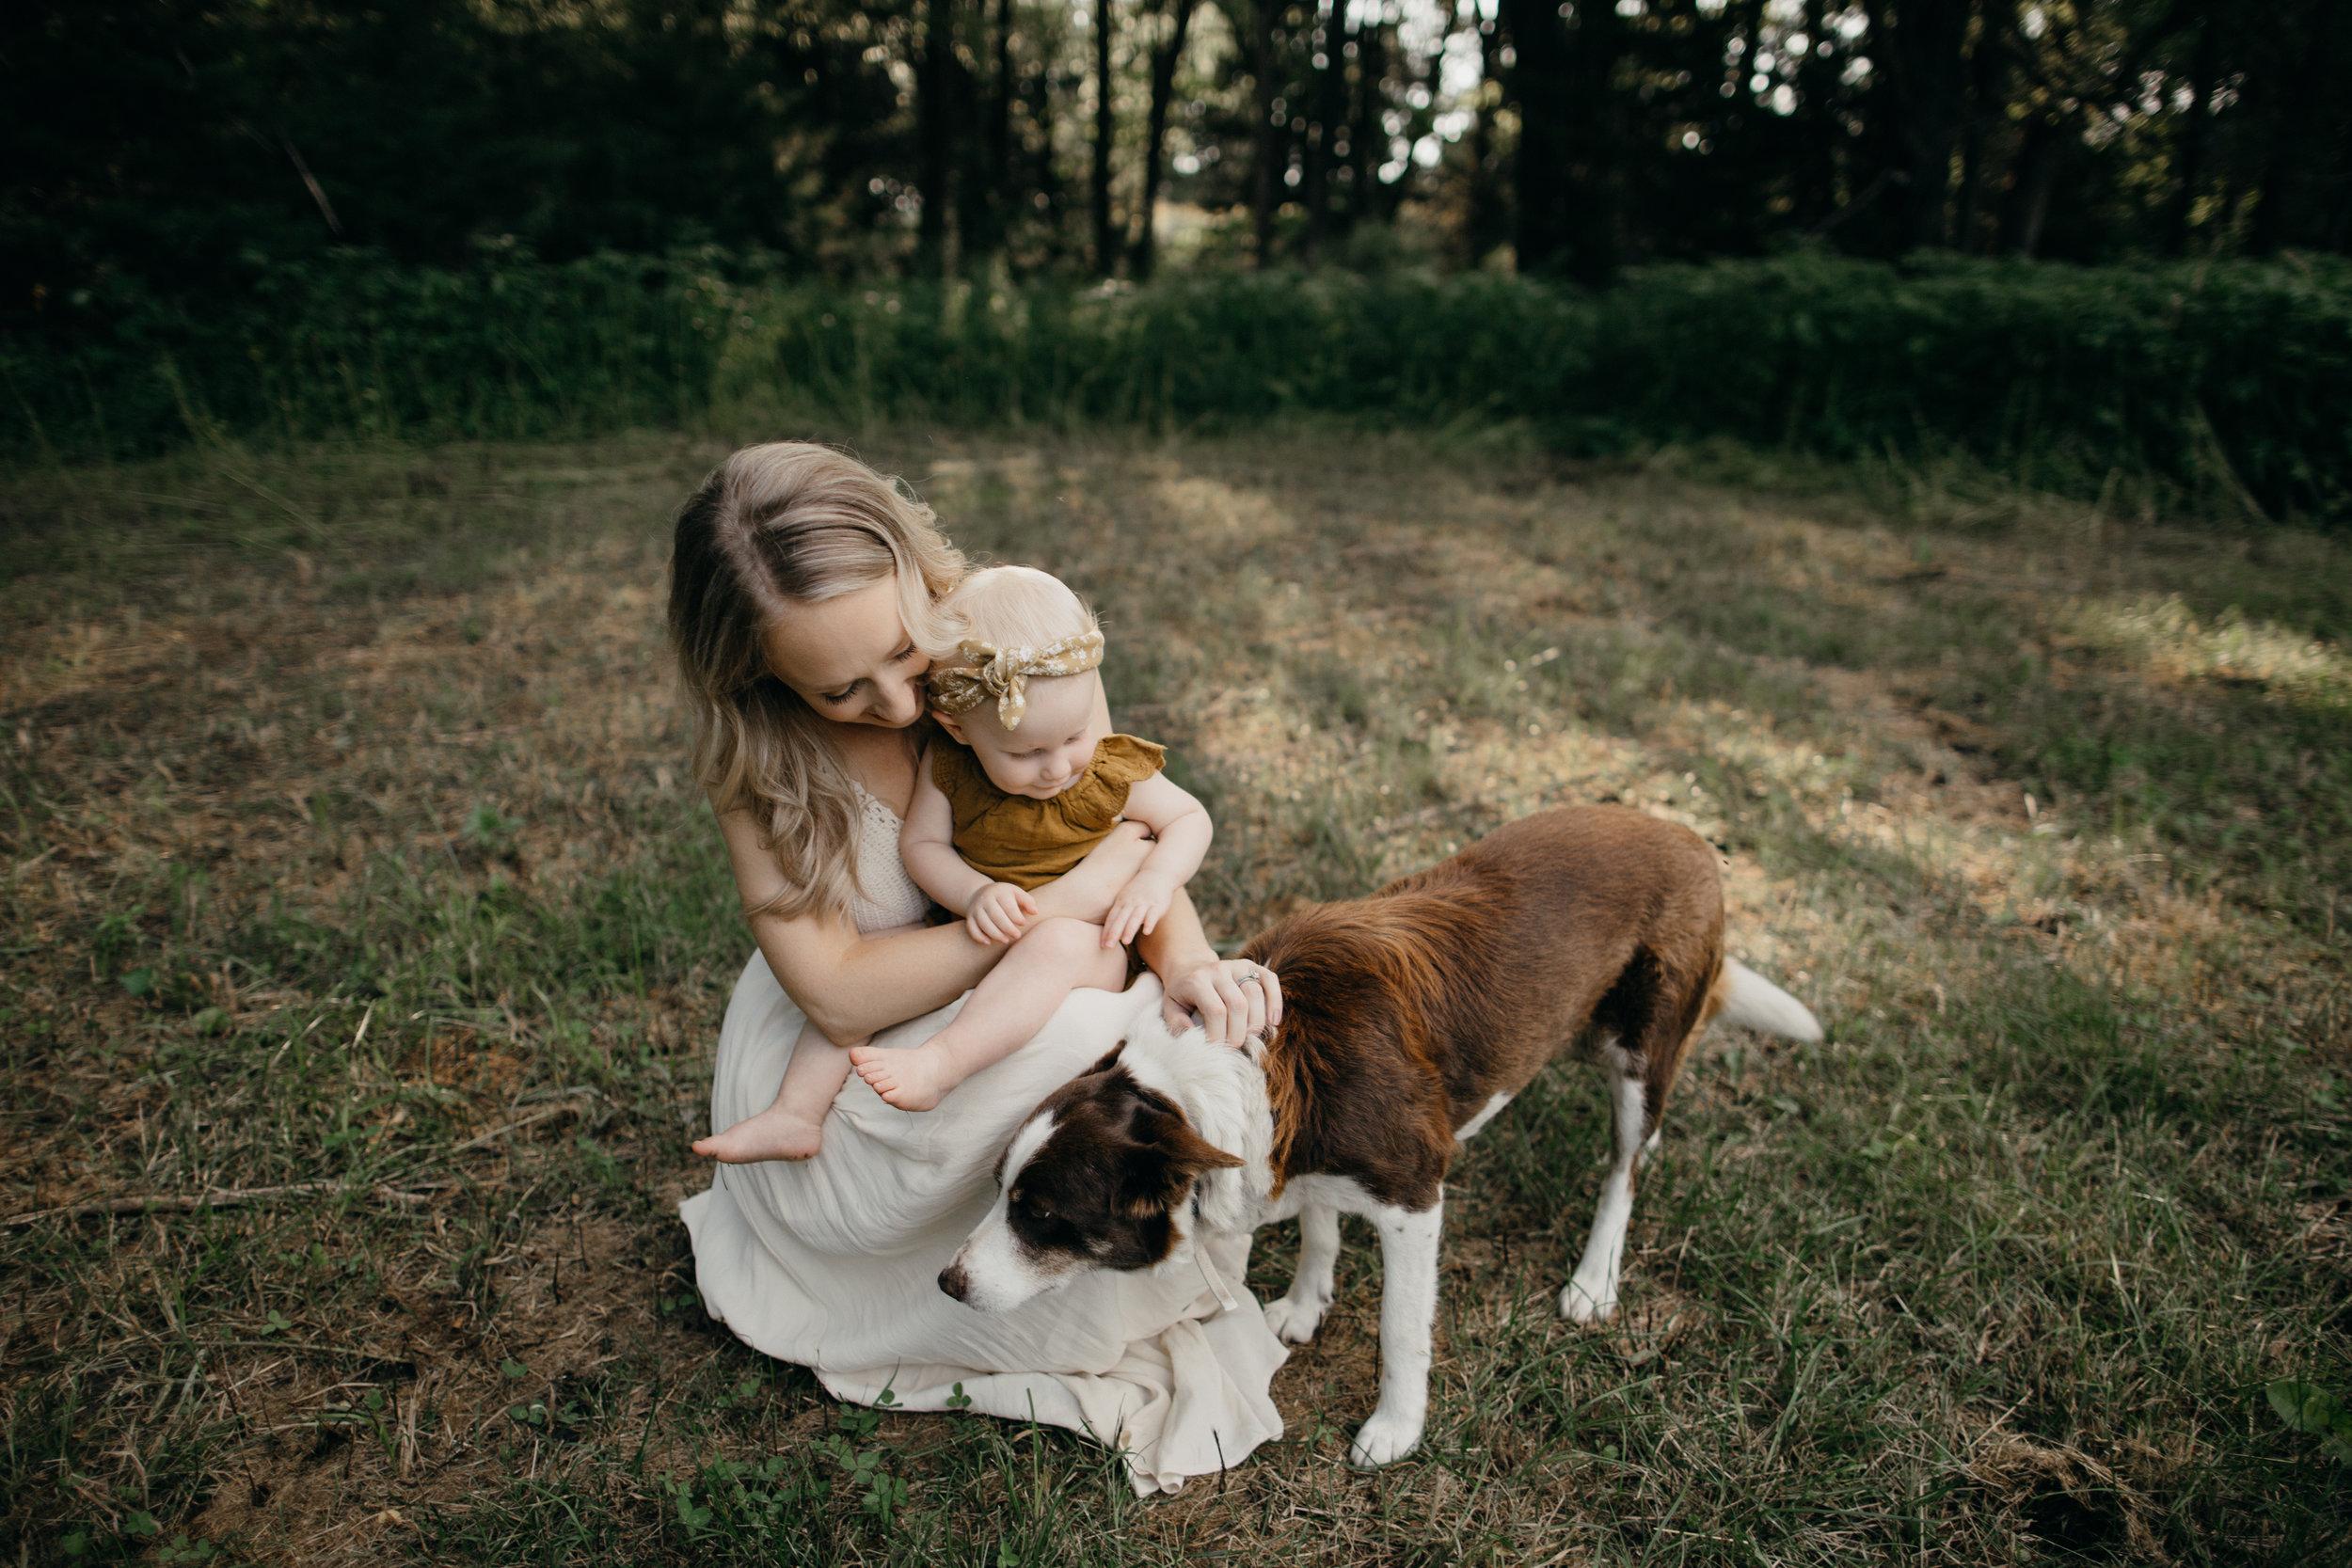 jamieleighmiller_omaha_nebraska_family_photographer-11.jpg